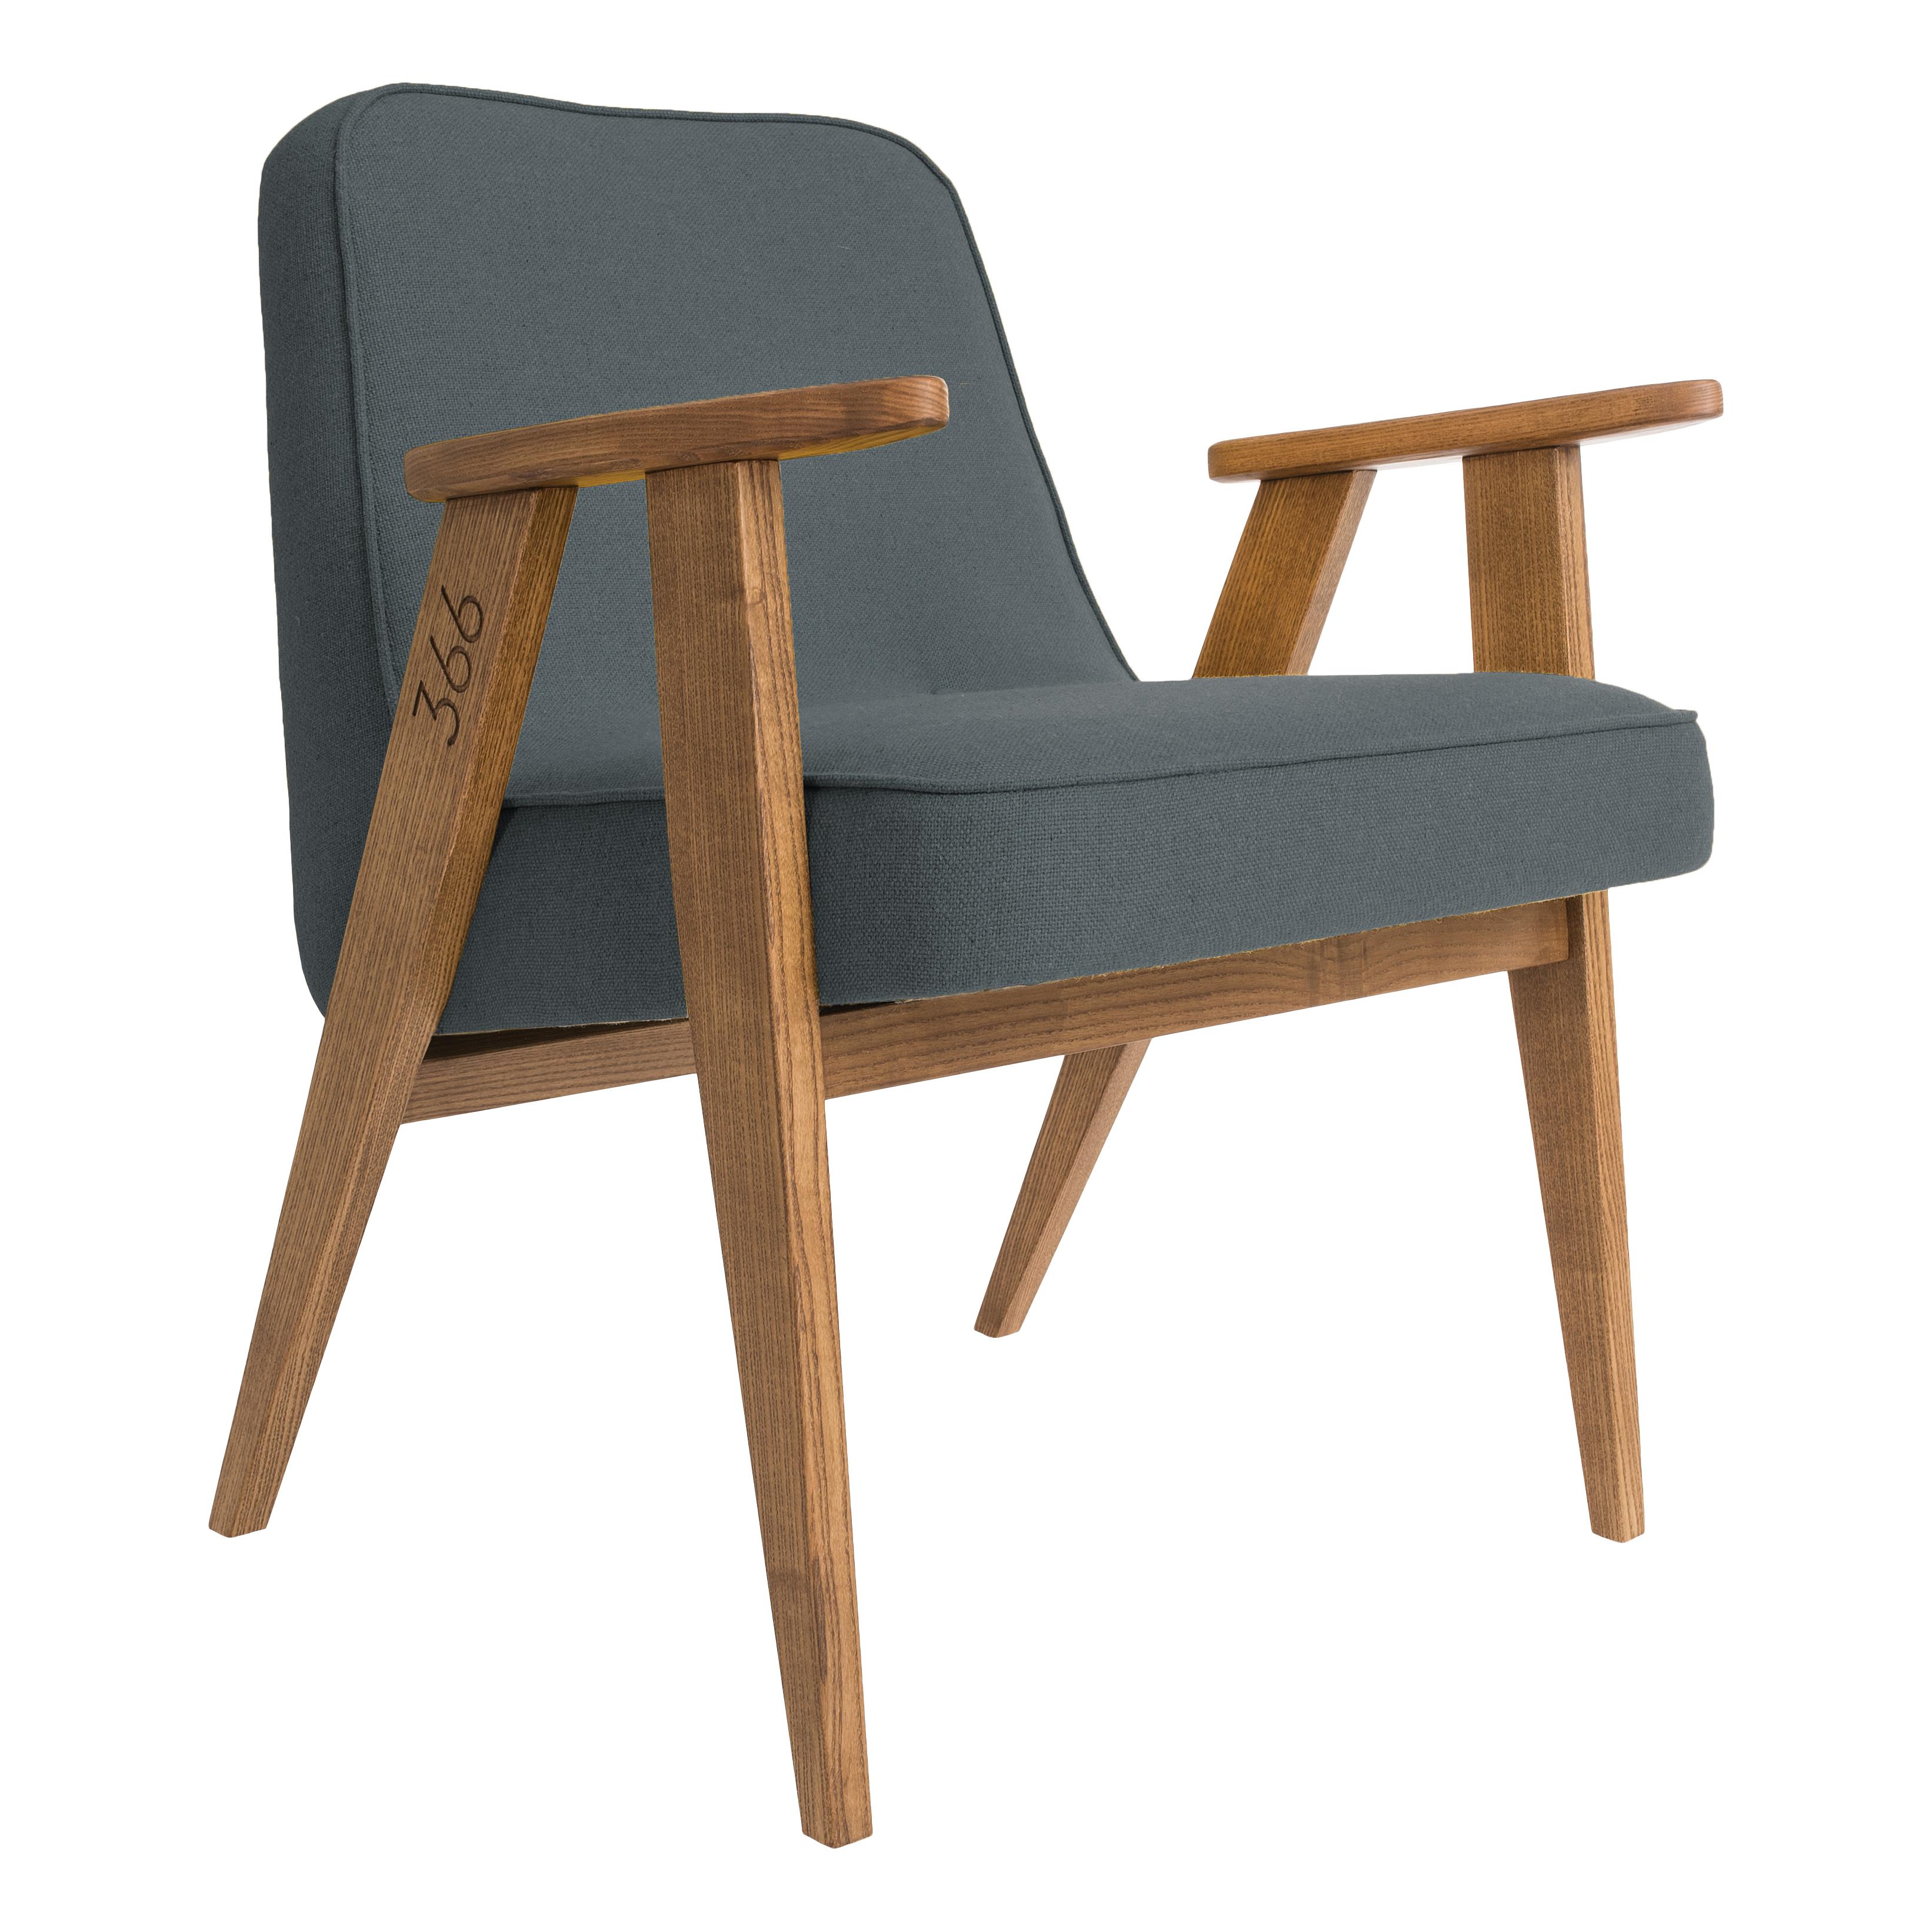 interior-design, furniture, armchairs, ARMCHAIR 366 PLUS WOOL - 366 Concept   366 easy chair   Wool 06 Light Blue   Oak